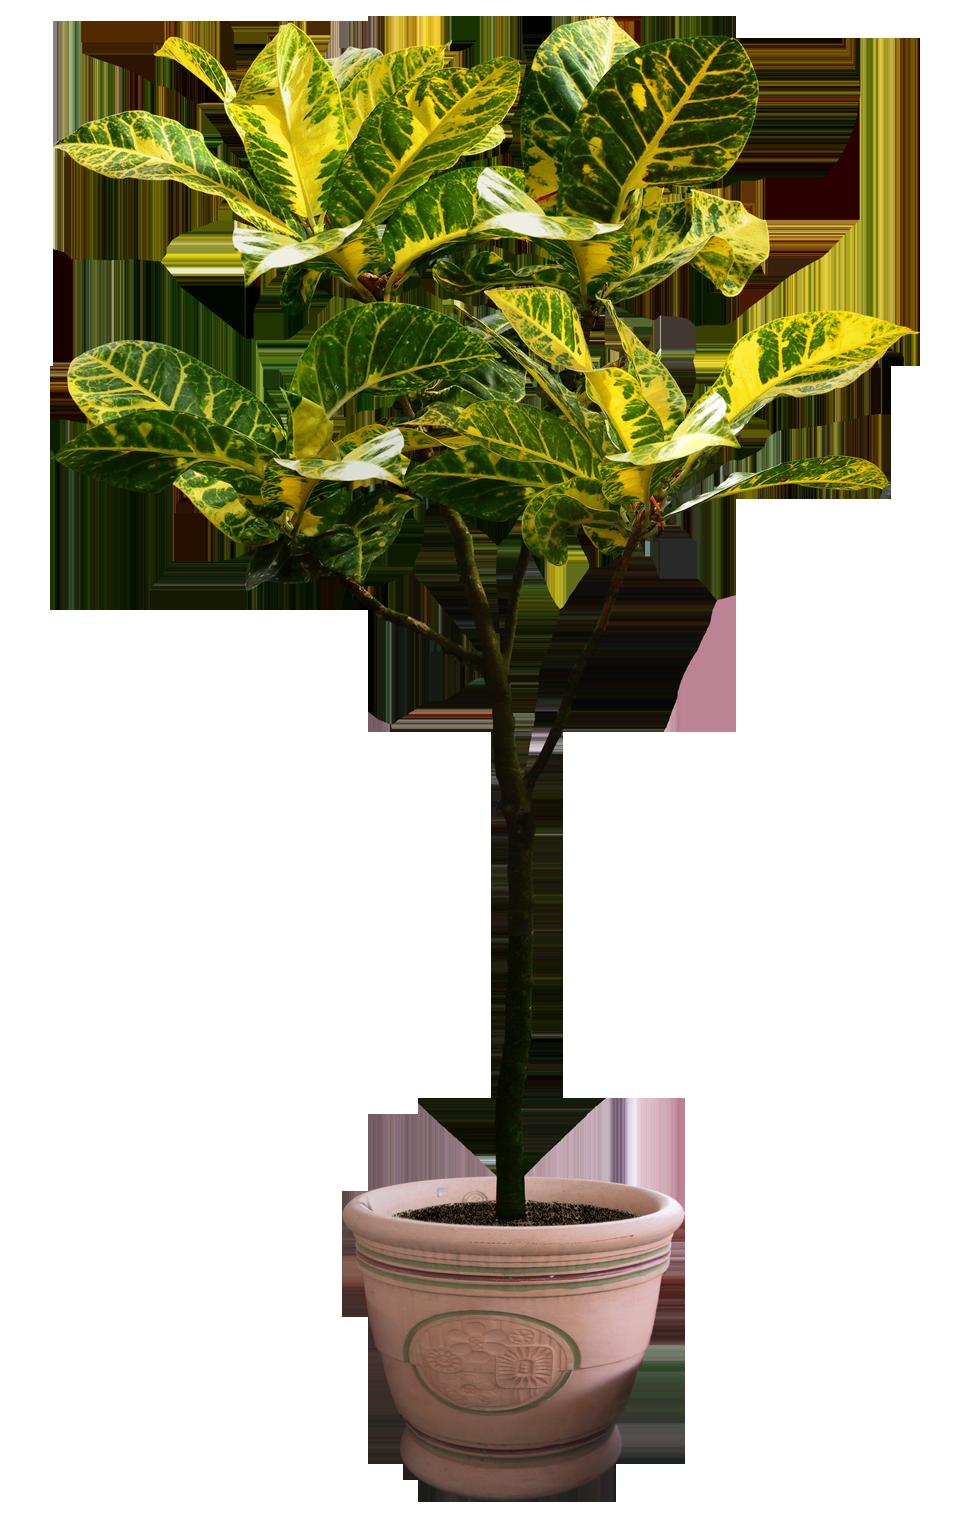 plant png 5 by DIGITALWIDERESOURCE on DeviantArt